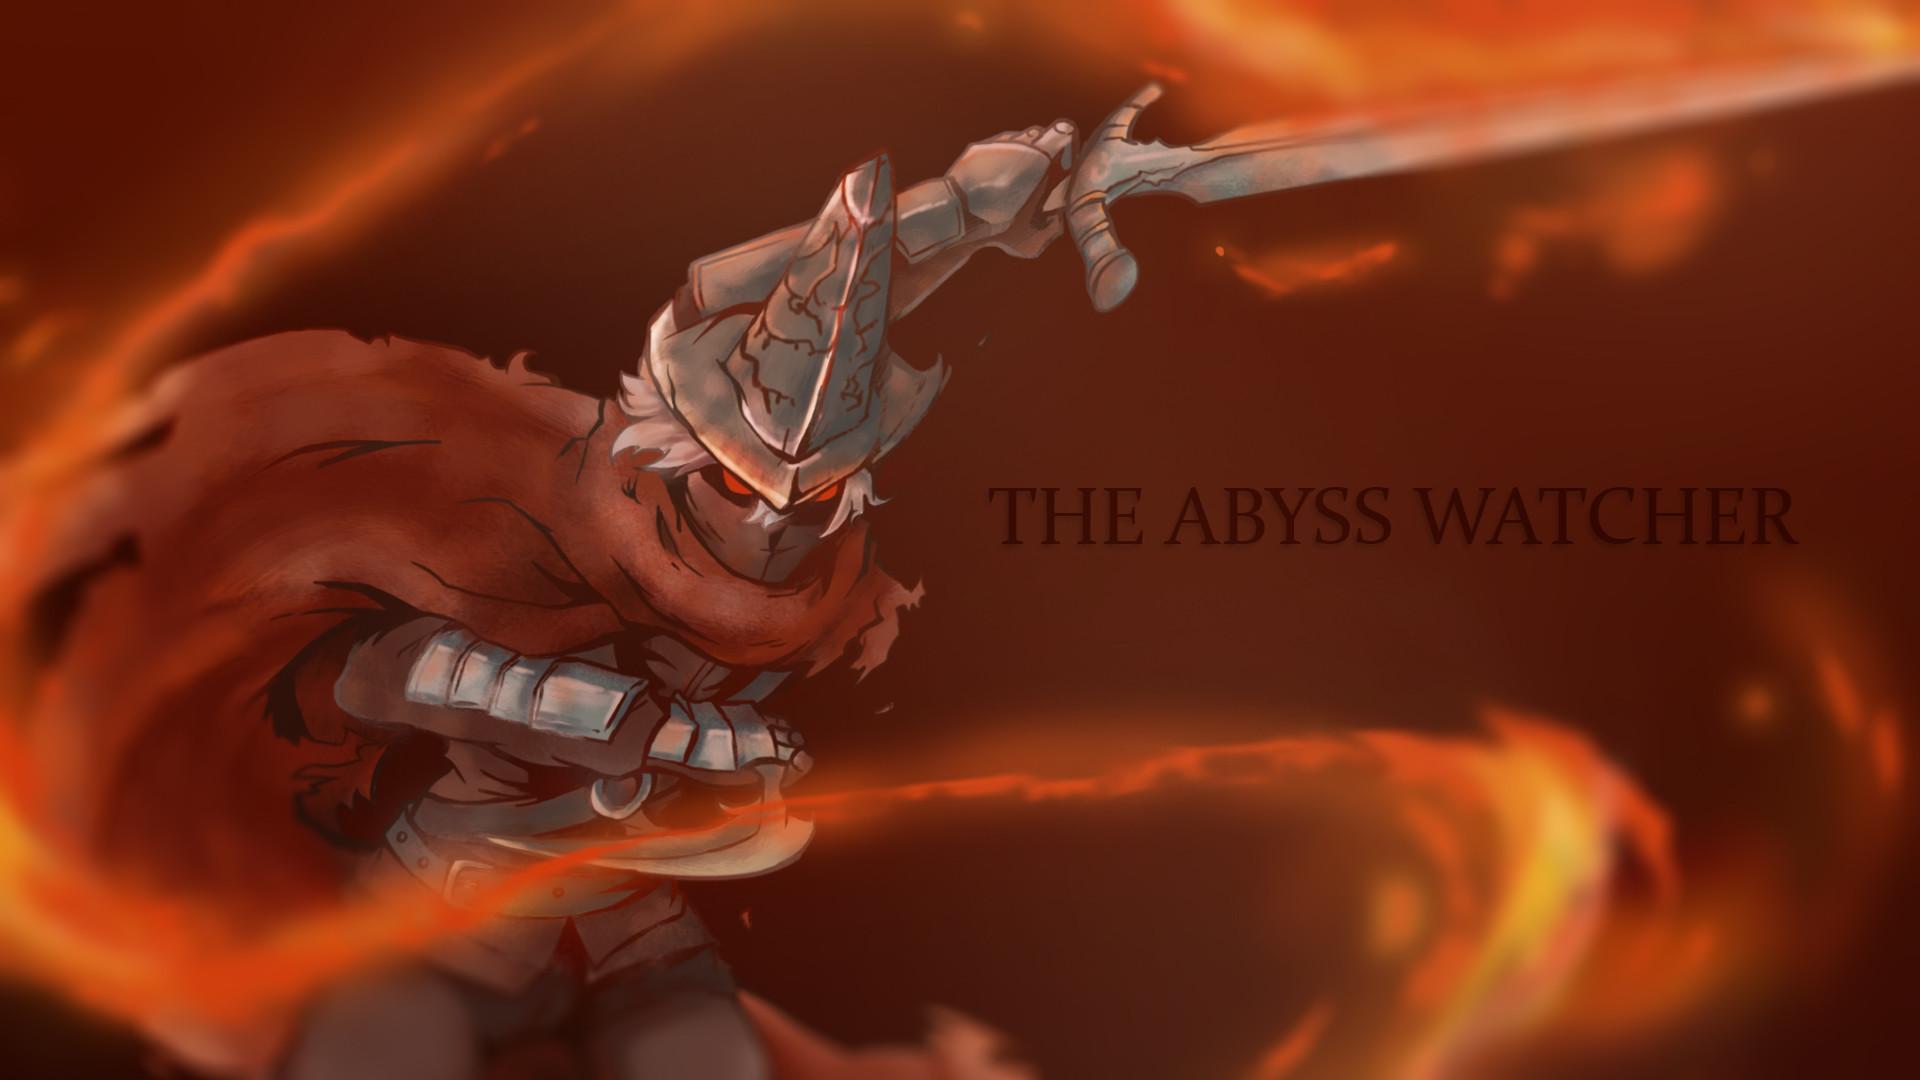 Wallpaper Dark Souls 3 Abyss Watchers Pict Art